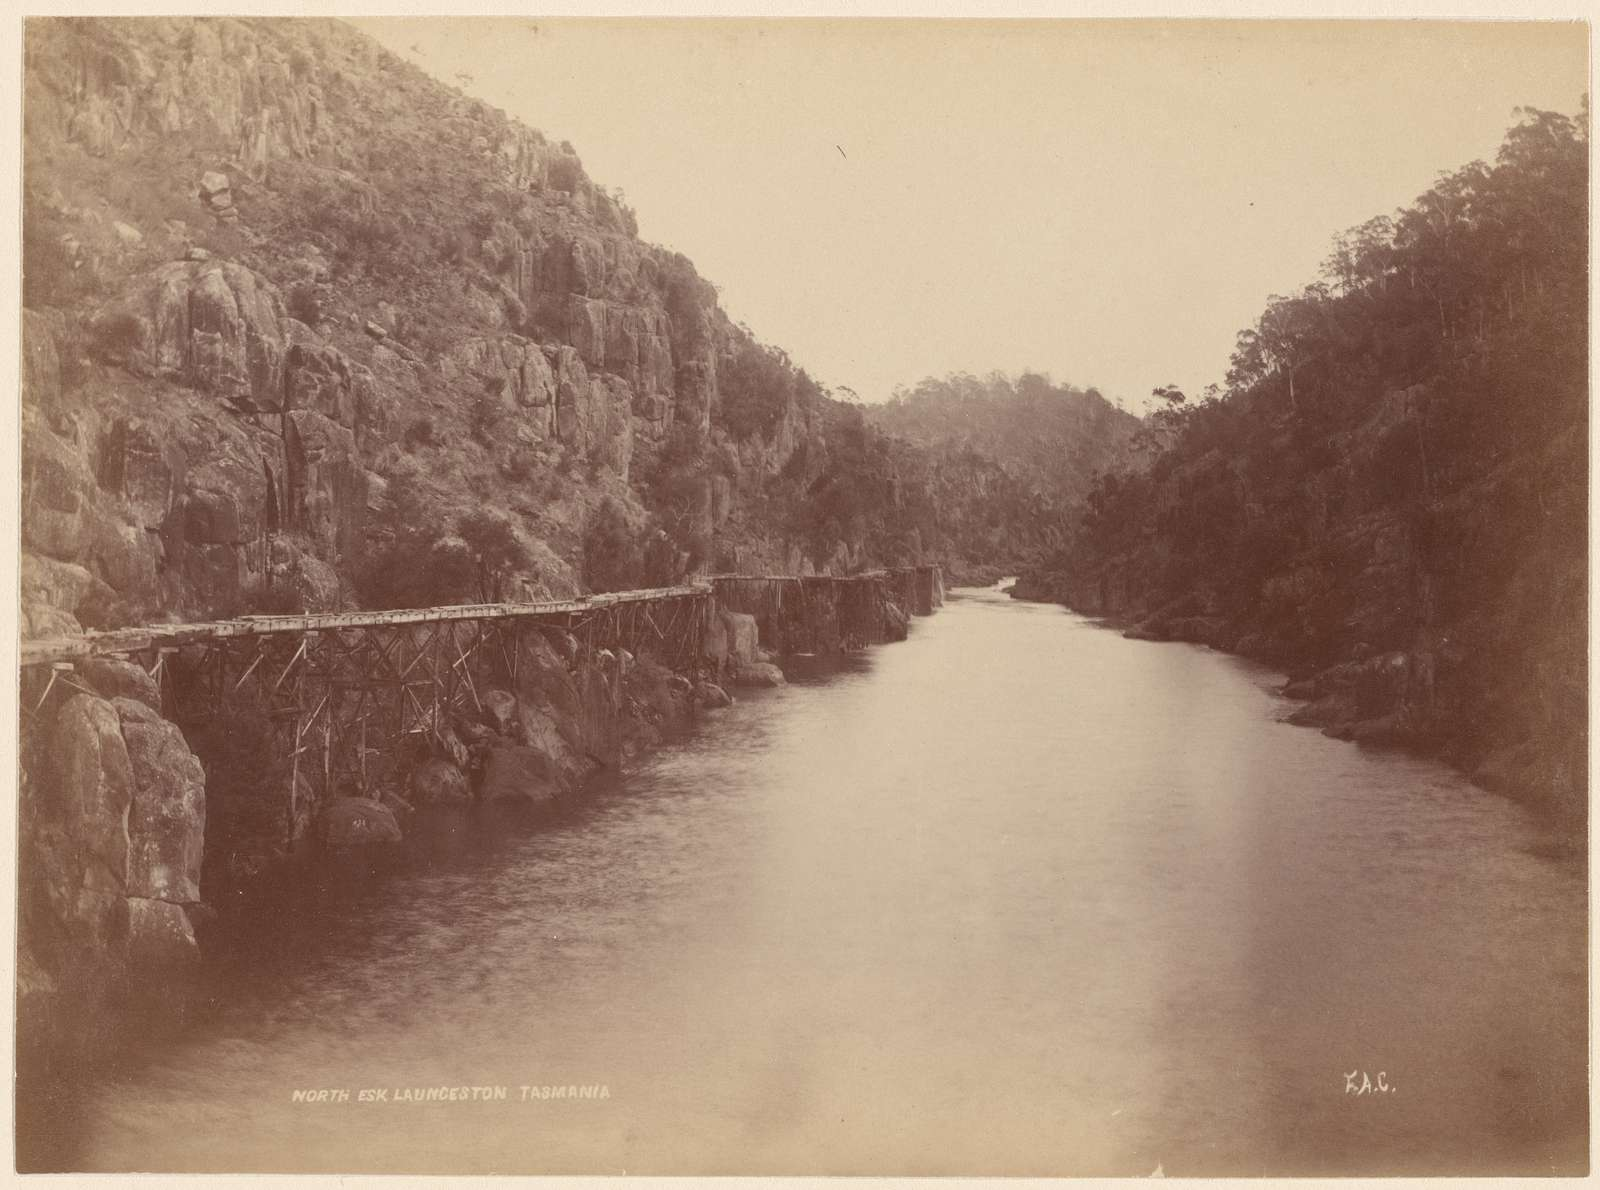 North Esk. Launceston, Tasmania